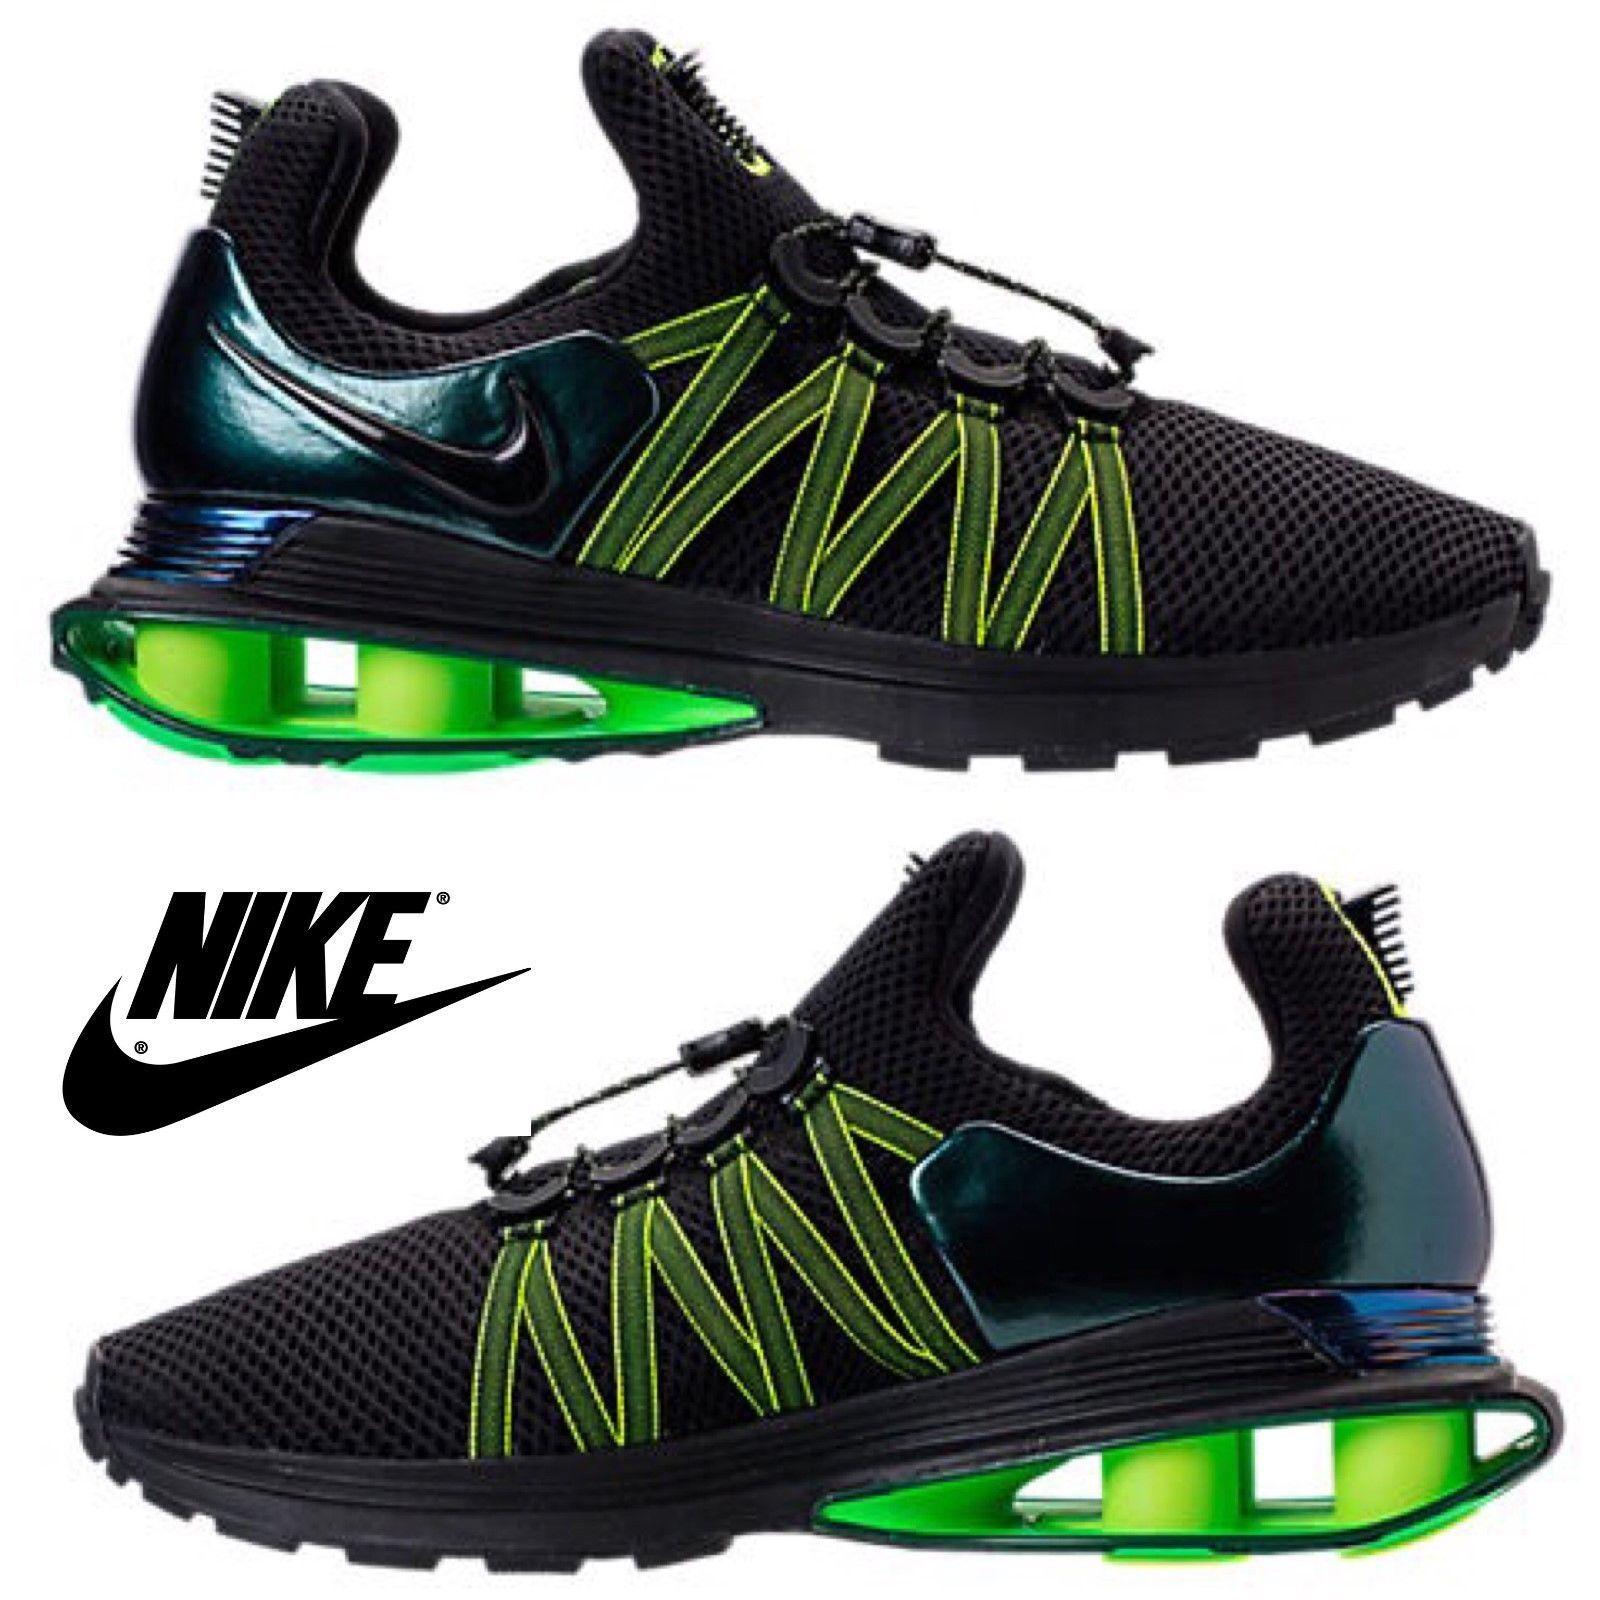 NIB Authentic NEW Homme Nike Shox Gravity AR1999-003 Chaussures Vapor Reax Bk Grn